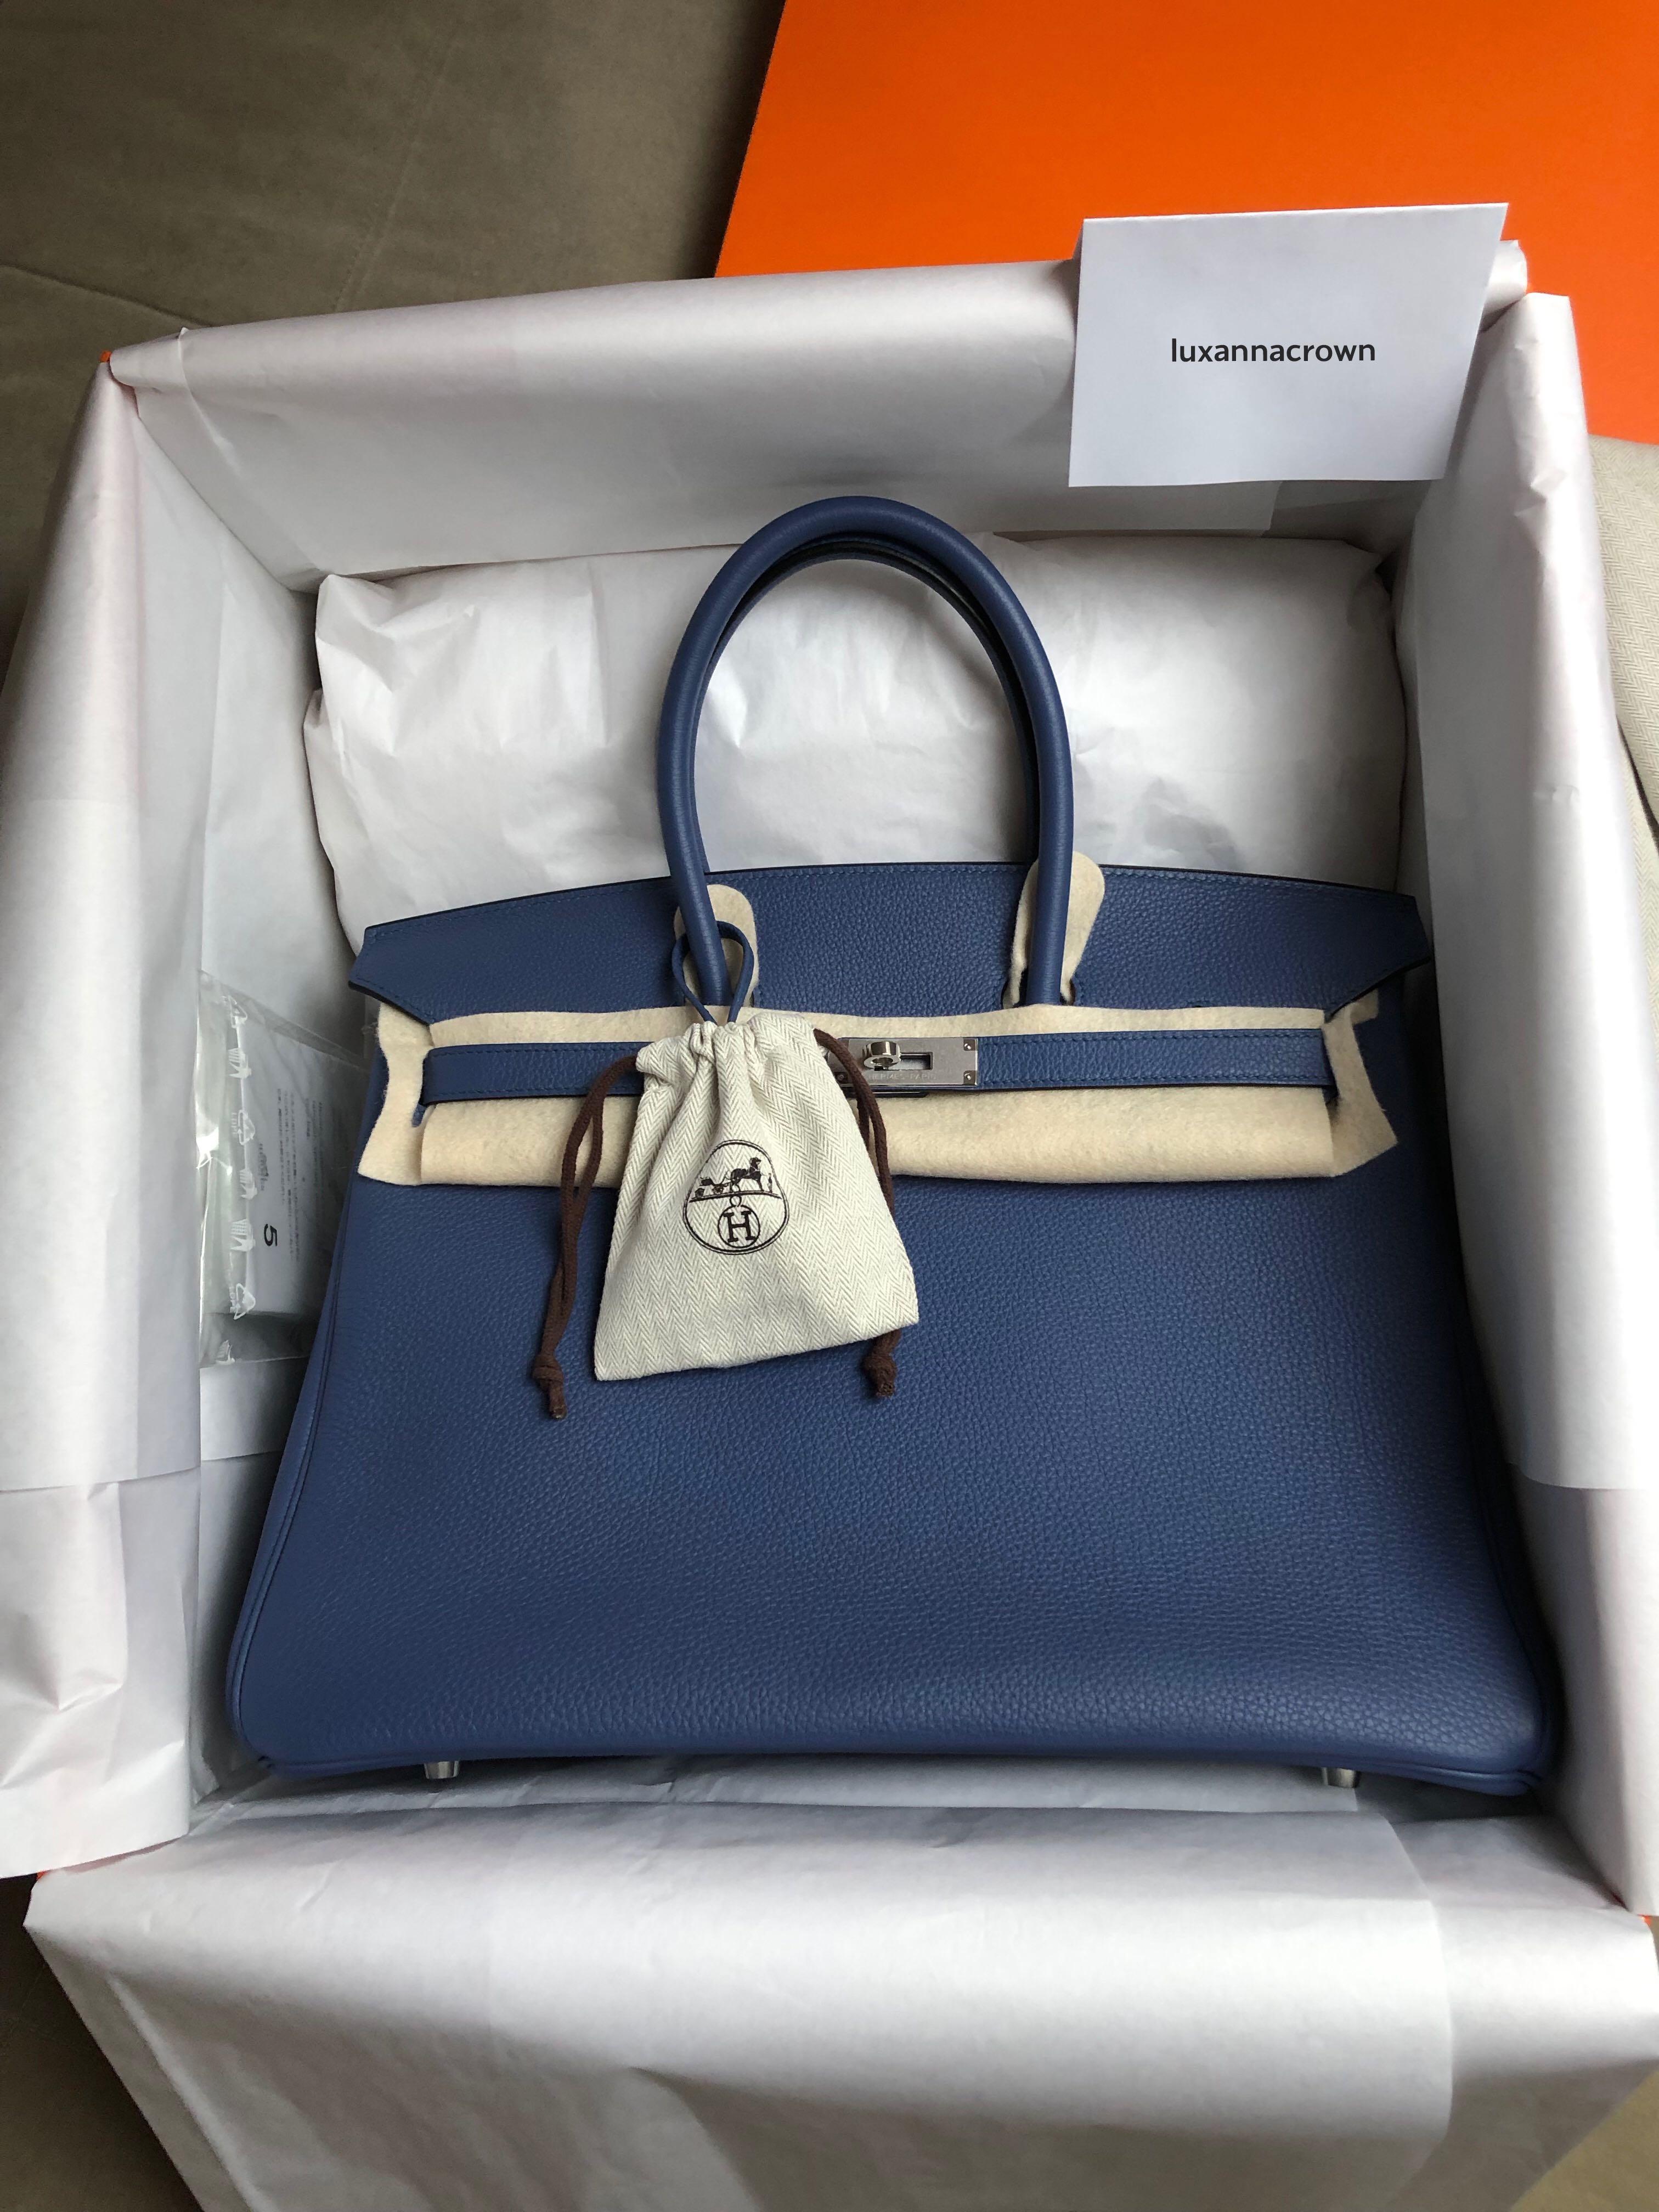 8aba2971738 Authentic Hermes Birkin 35 Bleu Agate Togo PHW